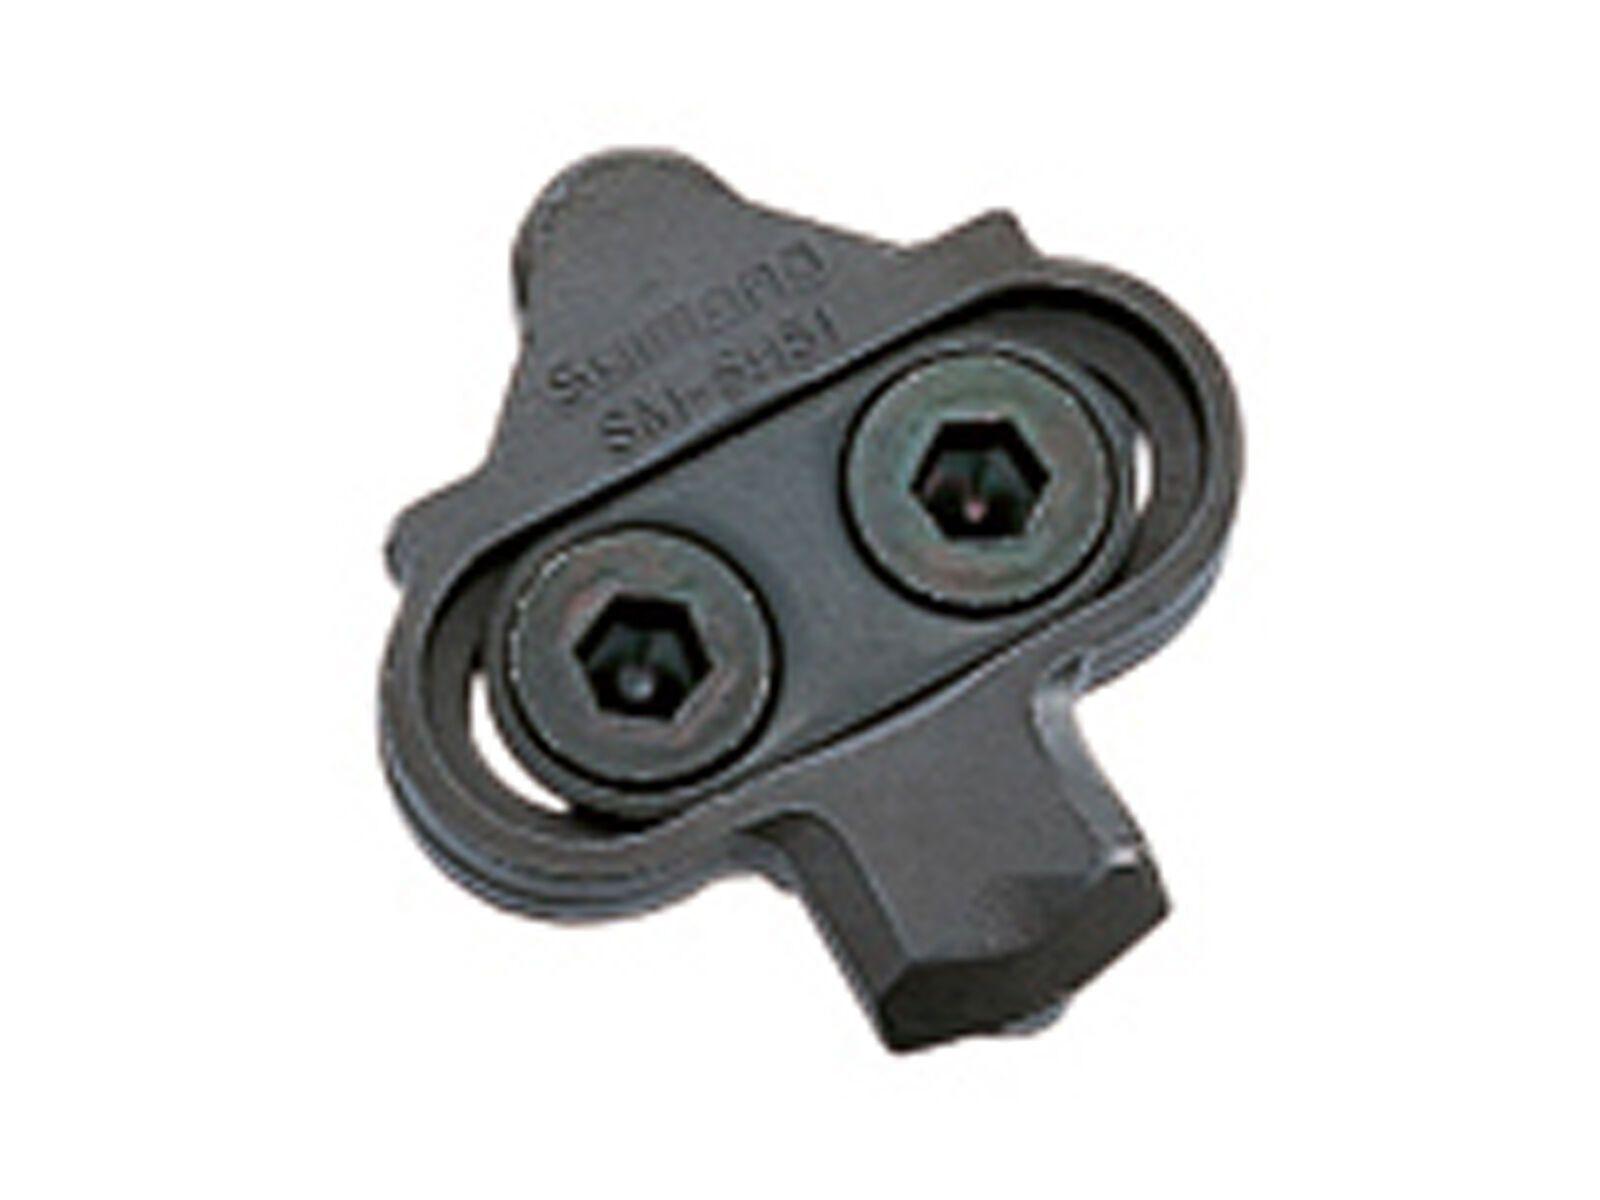 Shimano SM-SH51 SPD ohne Gegenplatten Y-42498201